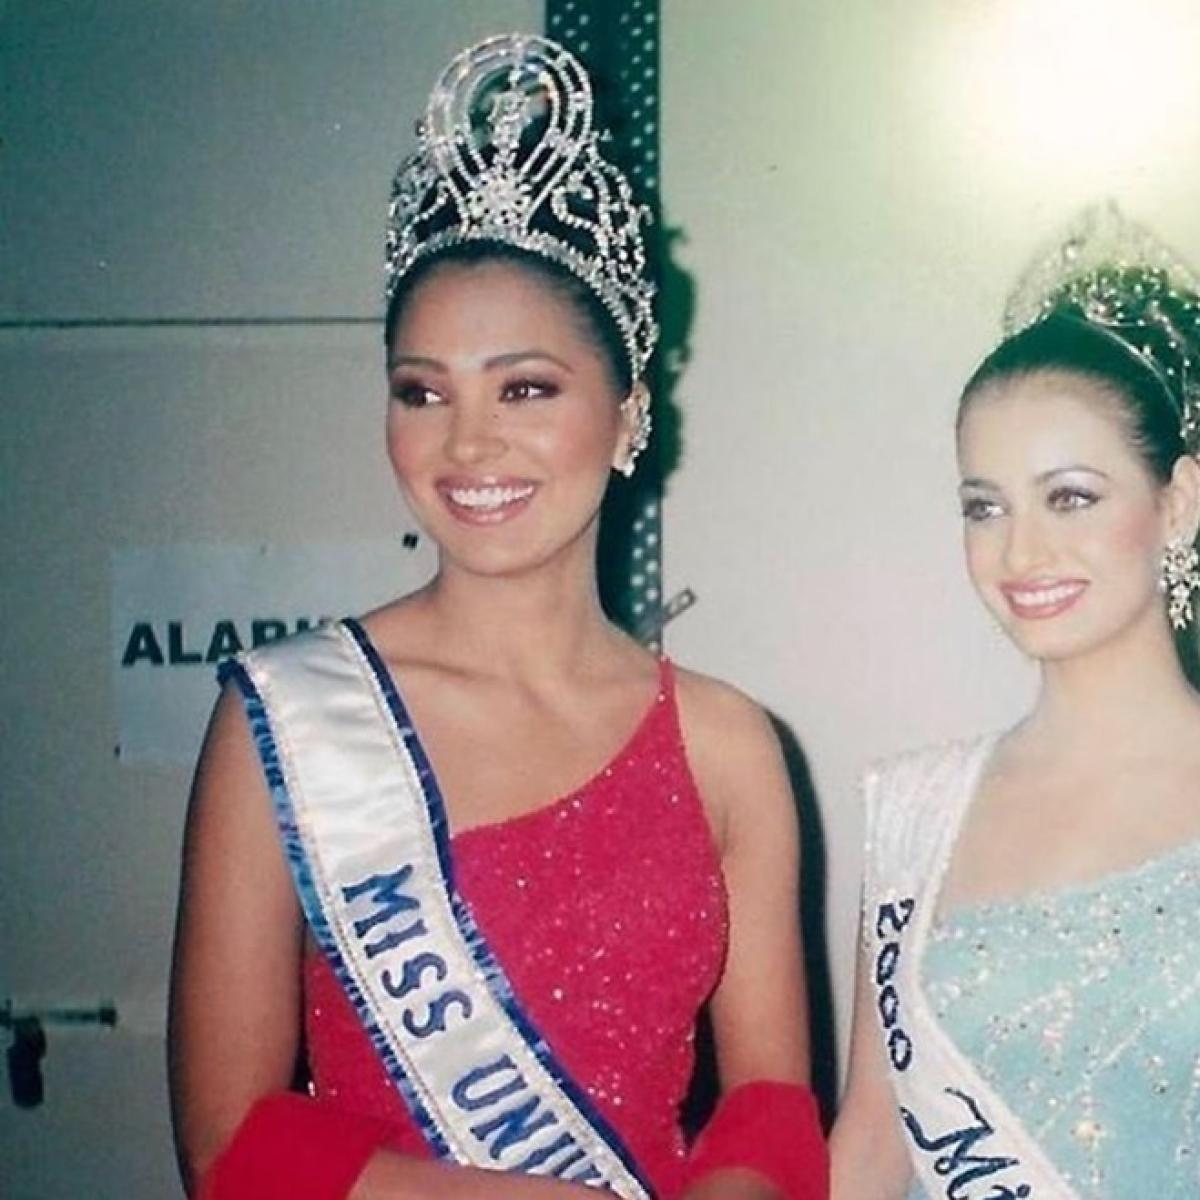 Lara Dutta reminisces her pageant crown with Dia Mirza and Priyanka Chopra